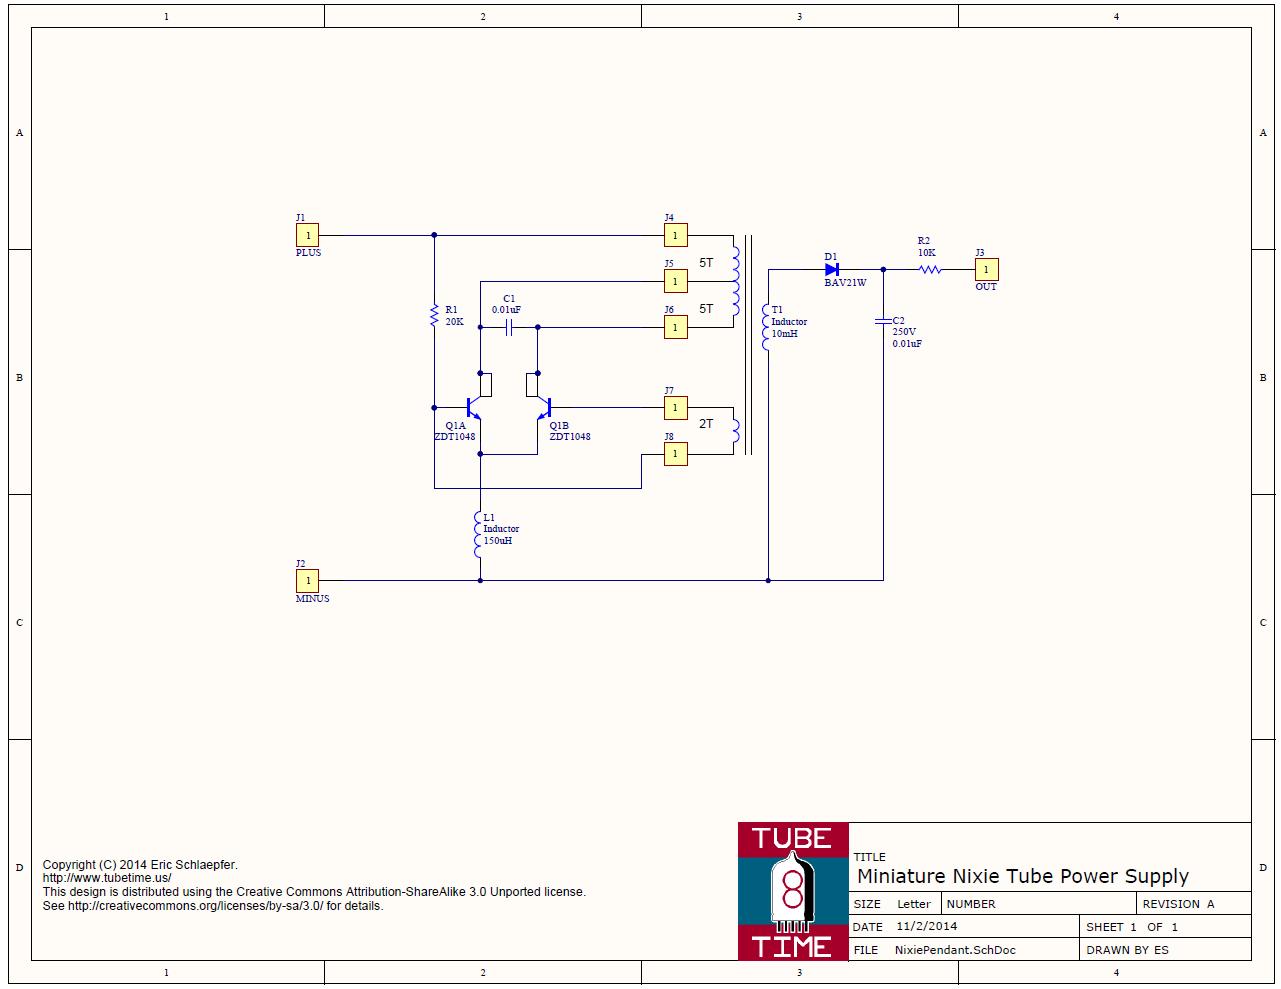 Photo: Miniature Nixie Power Supply Schematic